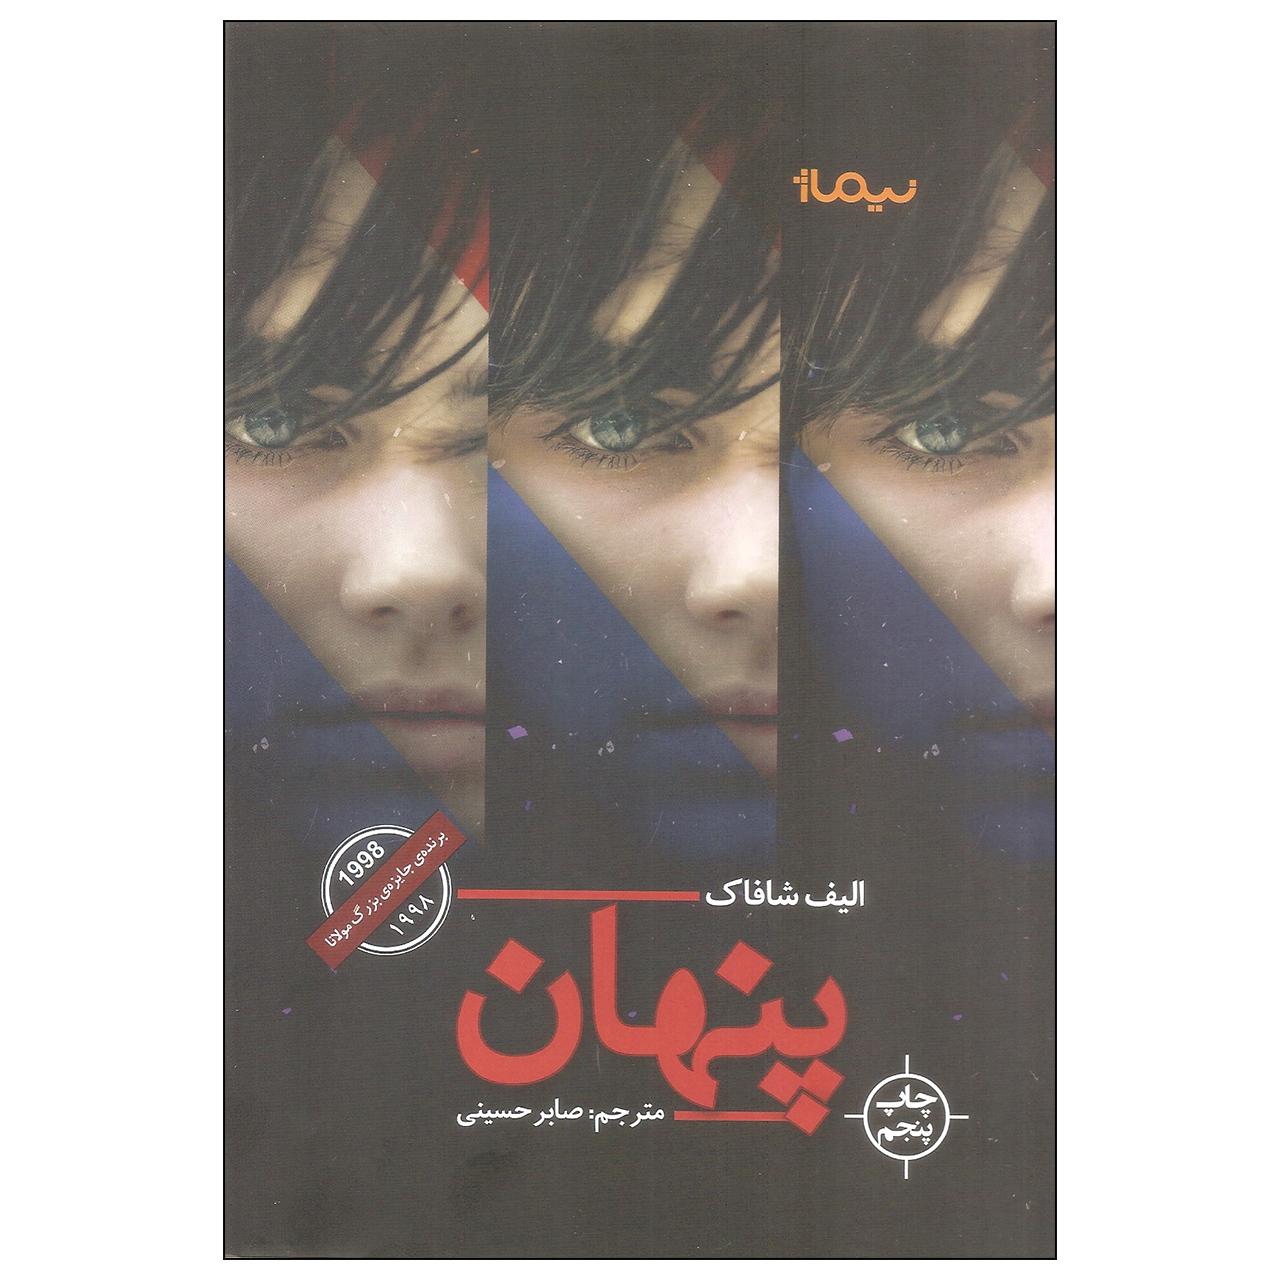 خرید                      کتاب پنهان اثر الیف شافاک نشر نیماژ